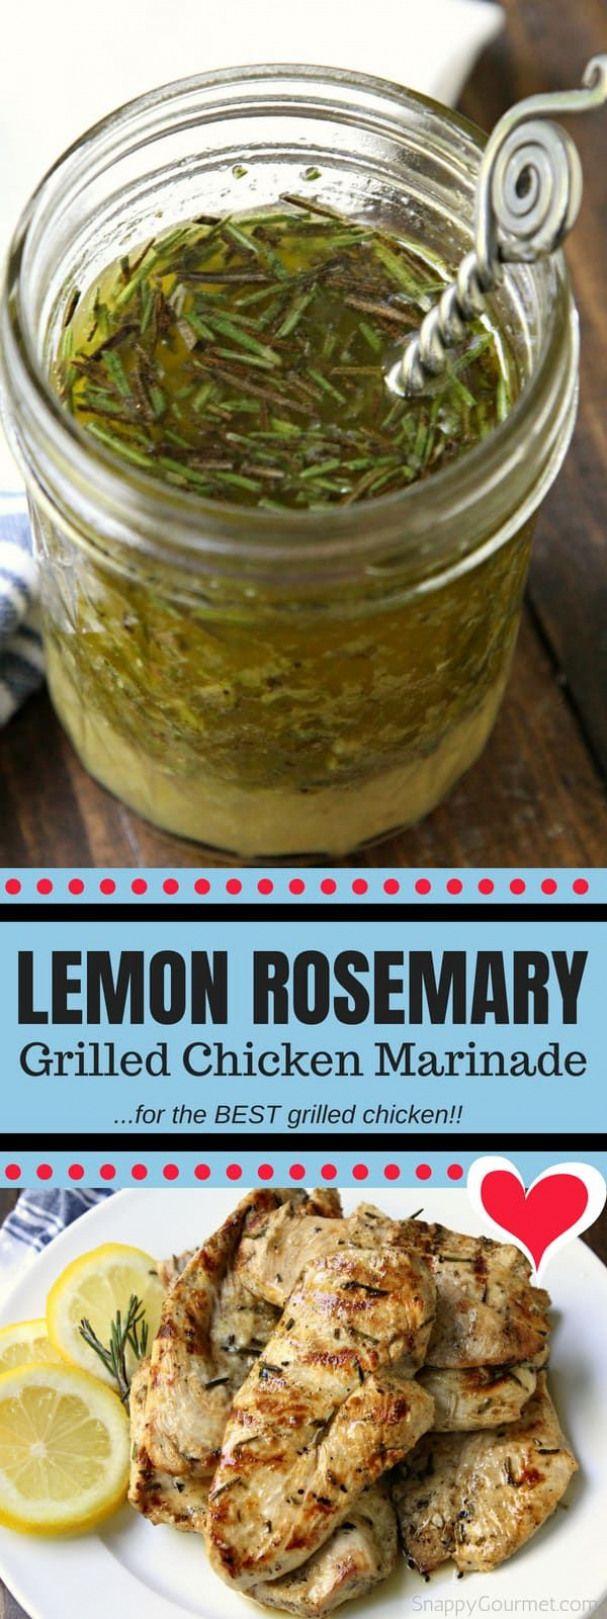 Lemon Rosemary Grilled Chicken Marinade - easy homemade marinade for the BEST grilled chicken! via